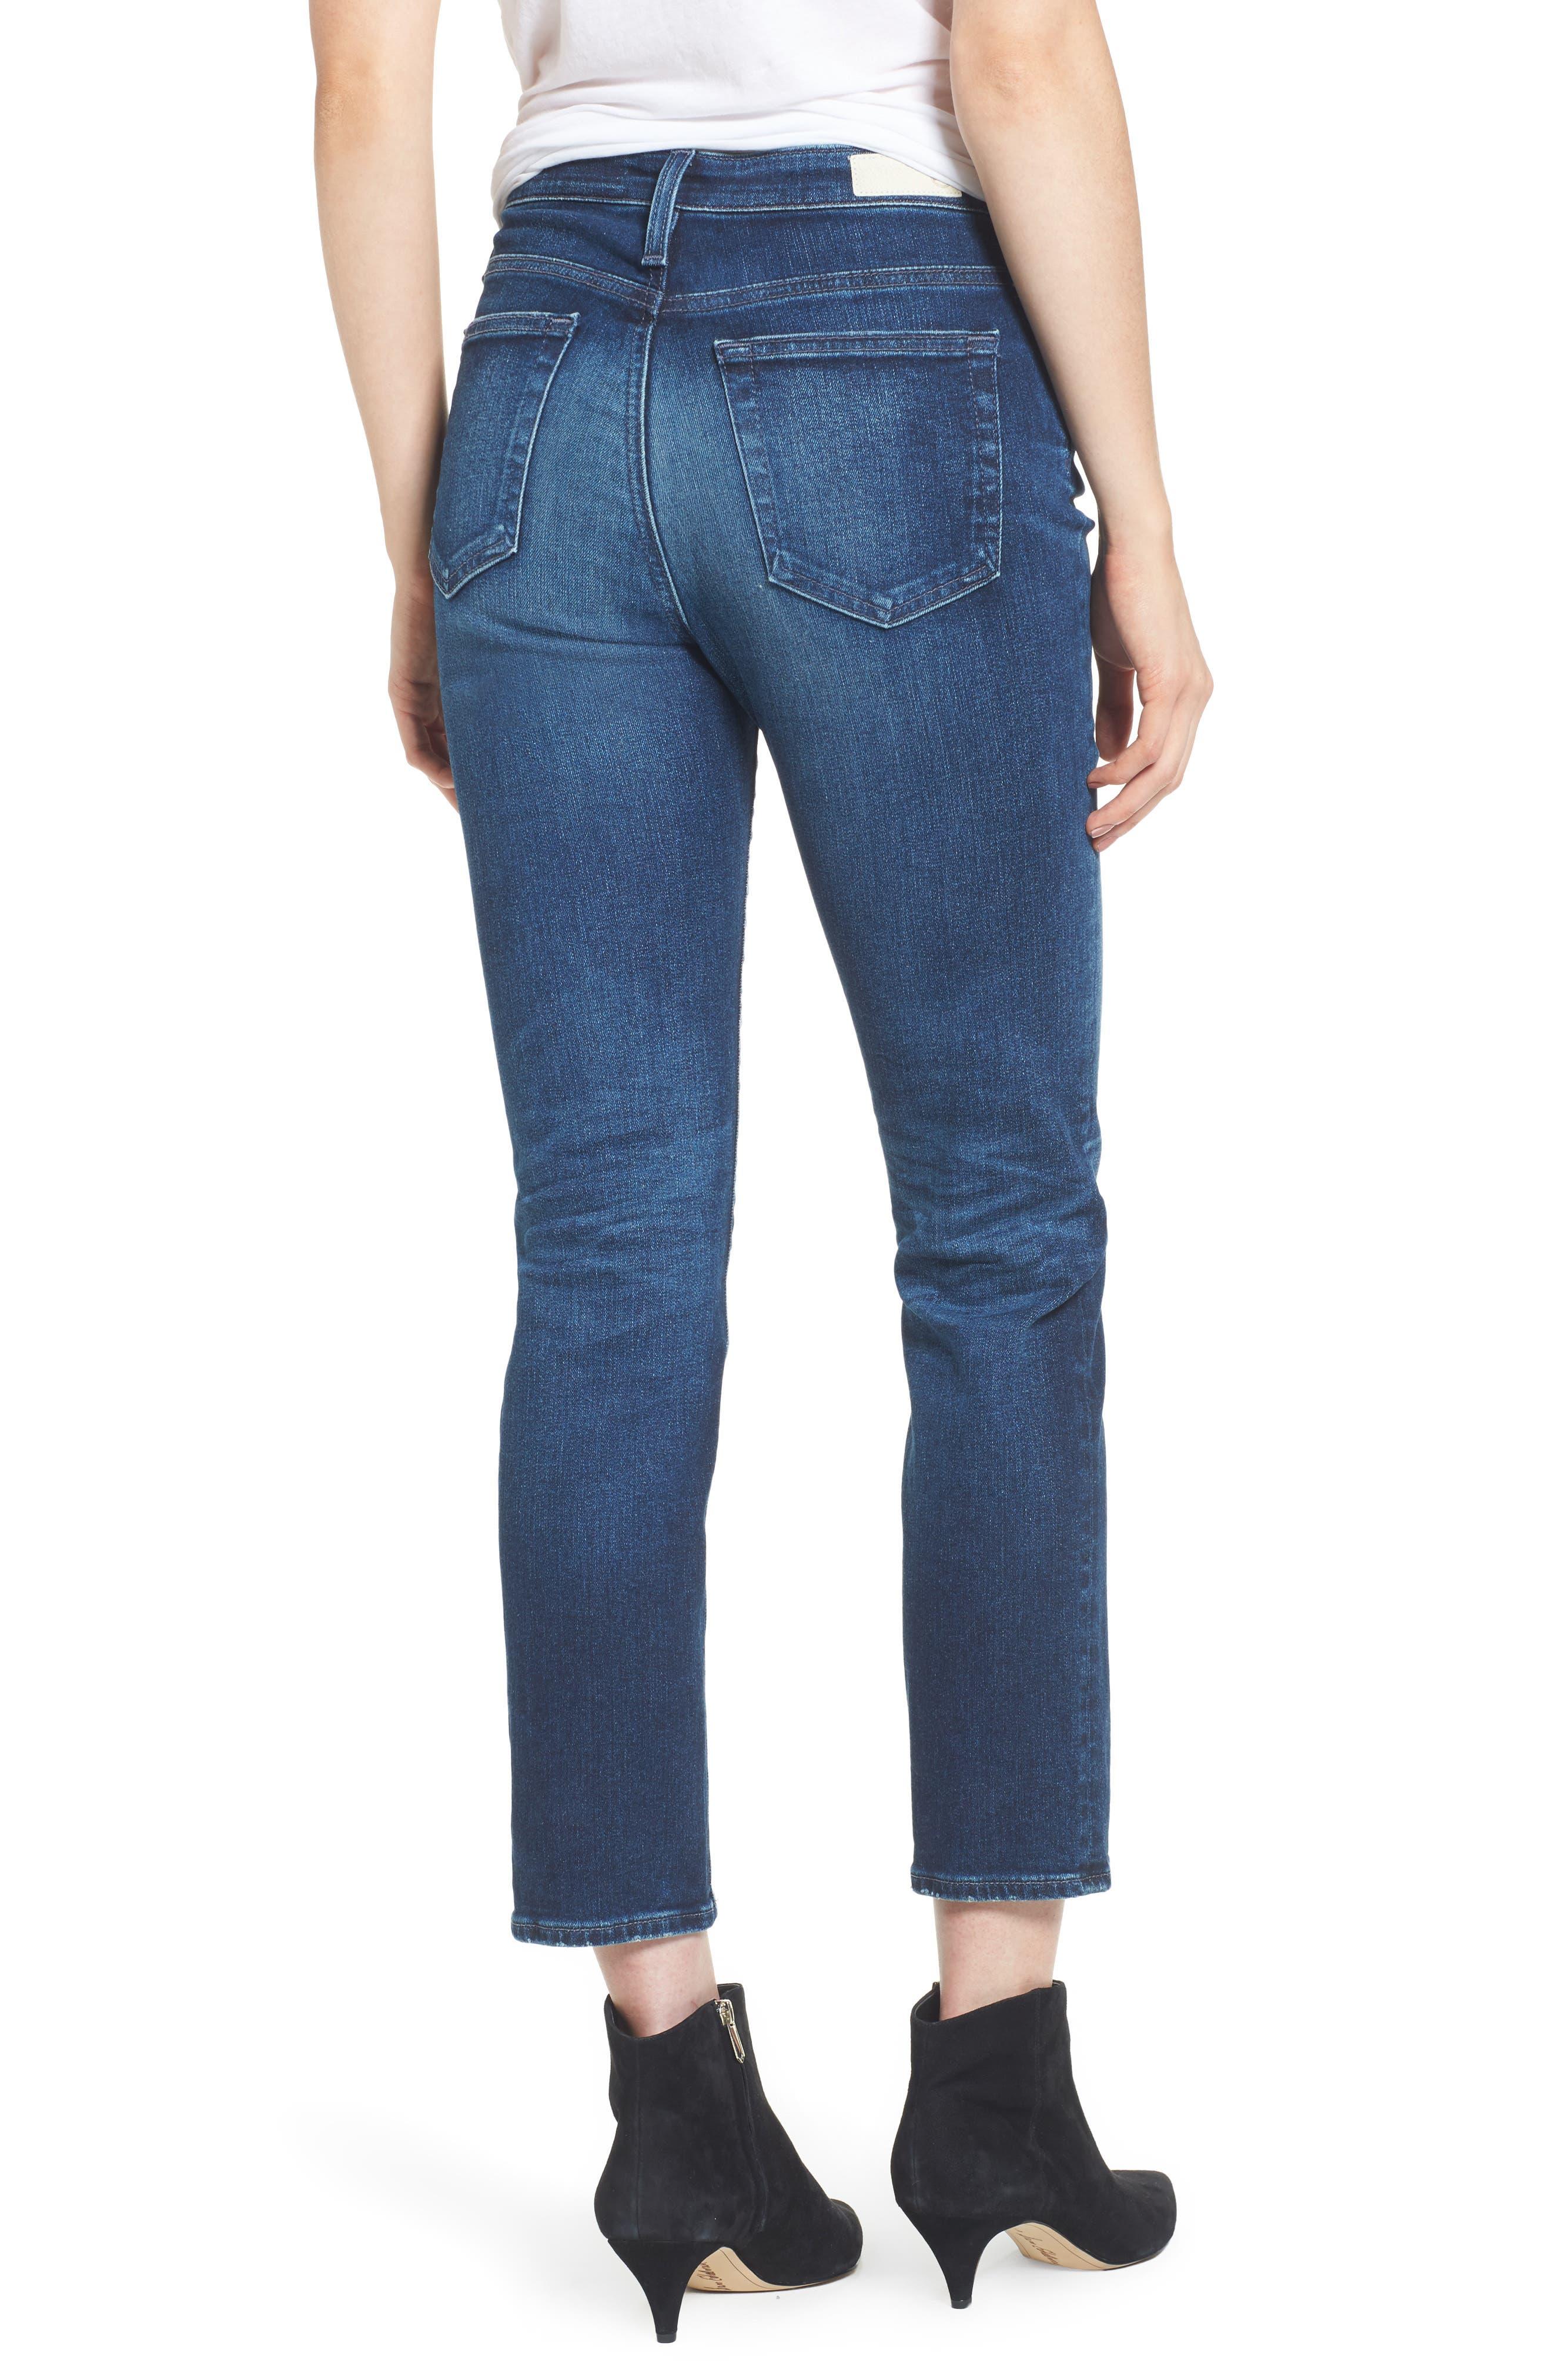 Alternate Image 2  - AG The Isabelle High Waist Crop Straight Leg Jeans (8 Years Ocean Tropic)